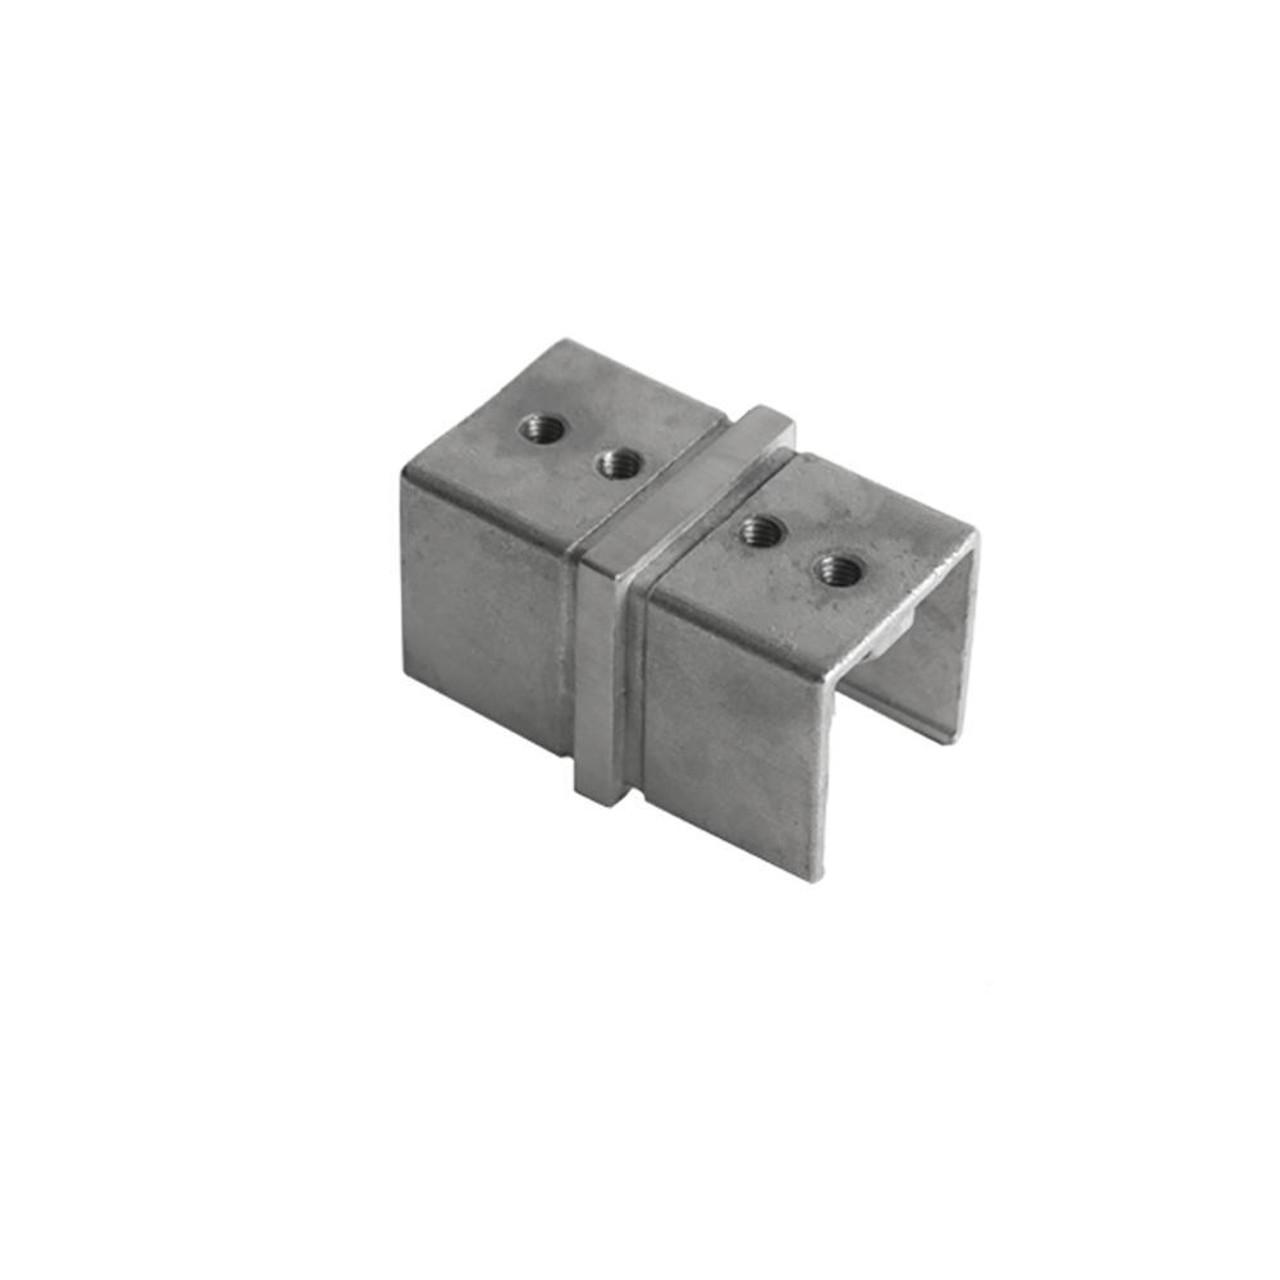 Square Glass Cap Rail Inline Splice Coupler (AX00.032.320.A.SP)